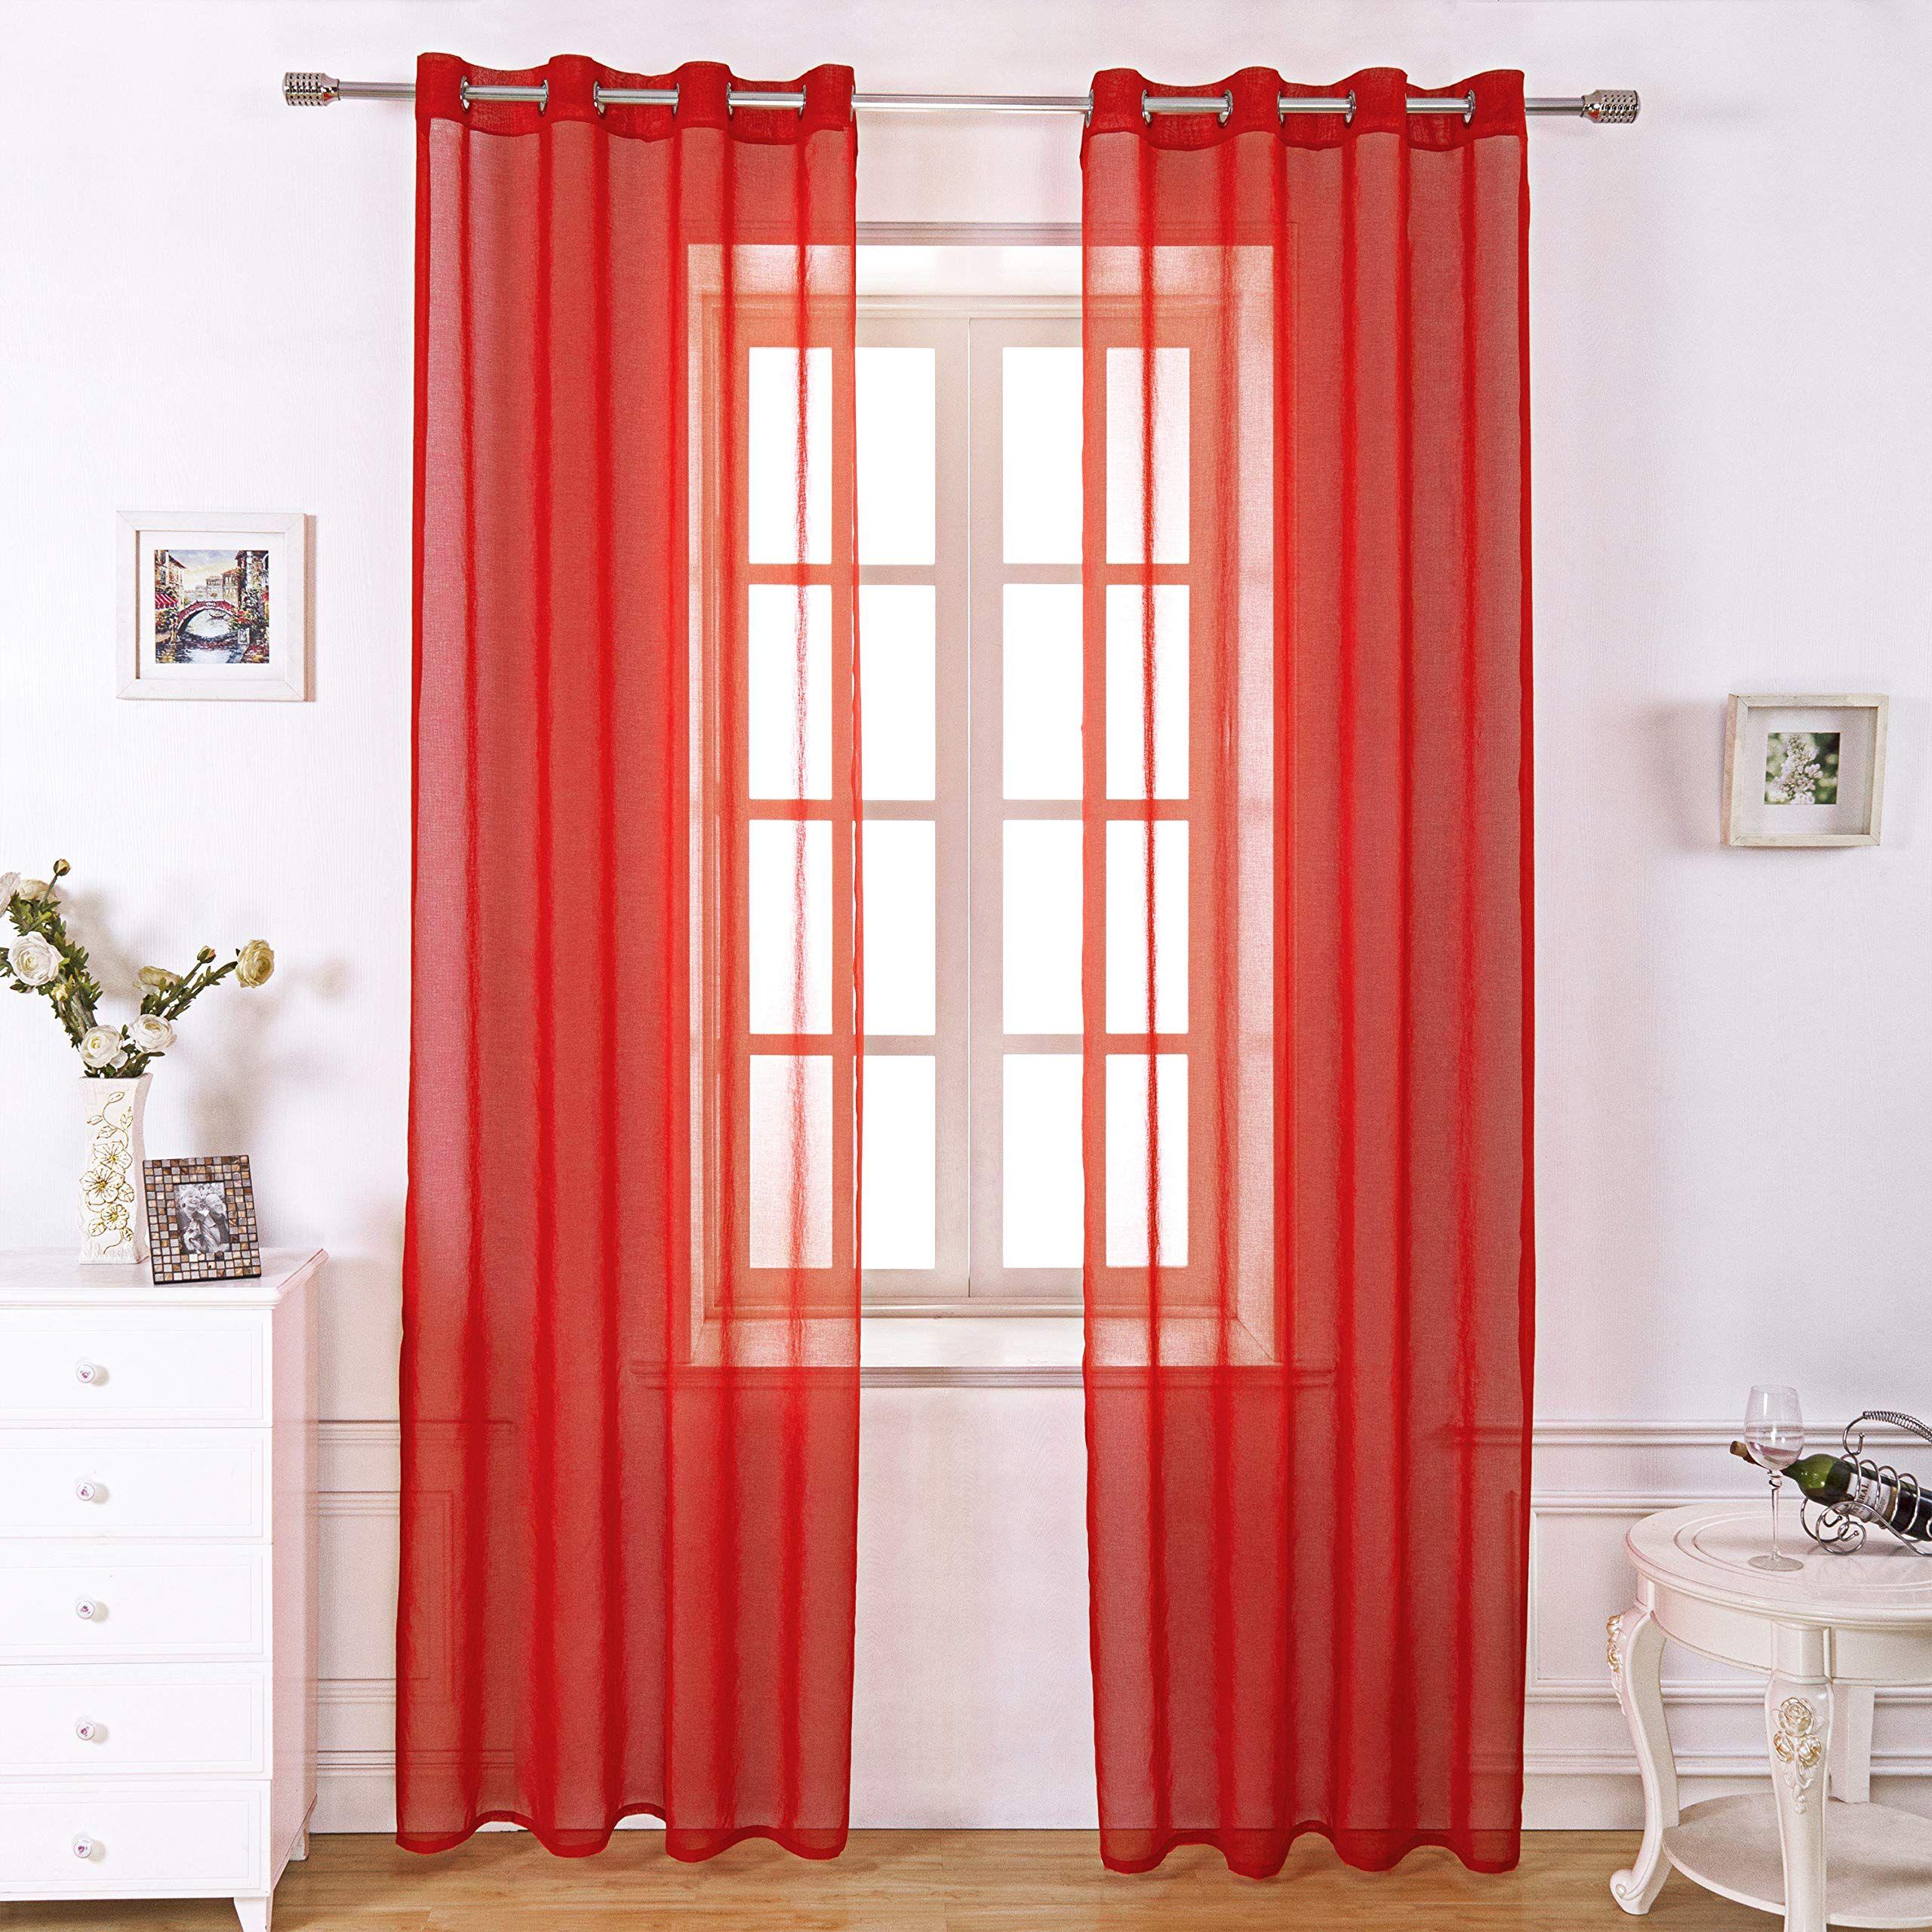 Selectex Linen Look Semi Sheer Curtains Grommet Voile Curtains